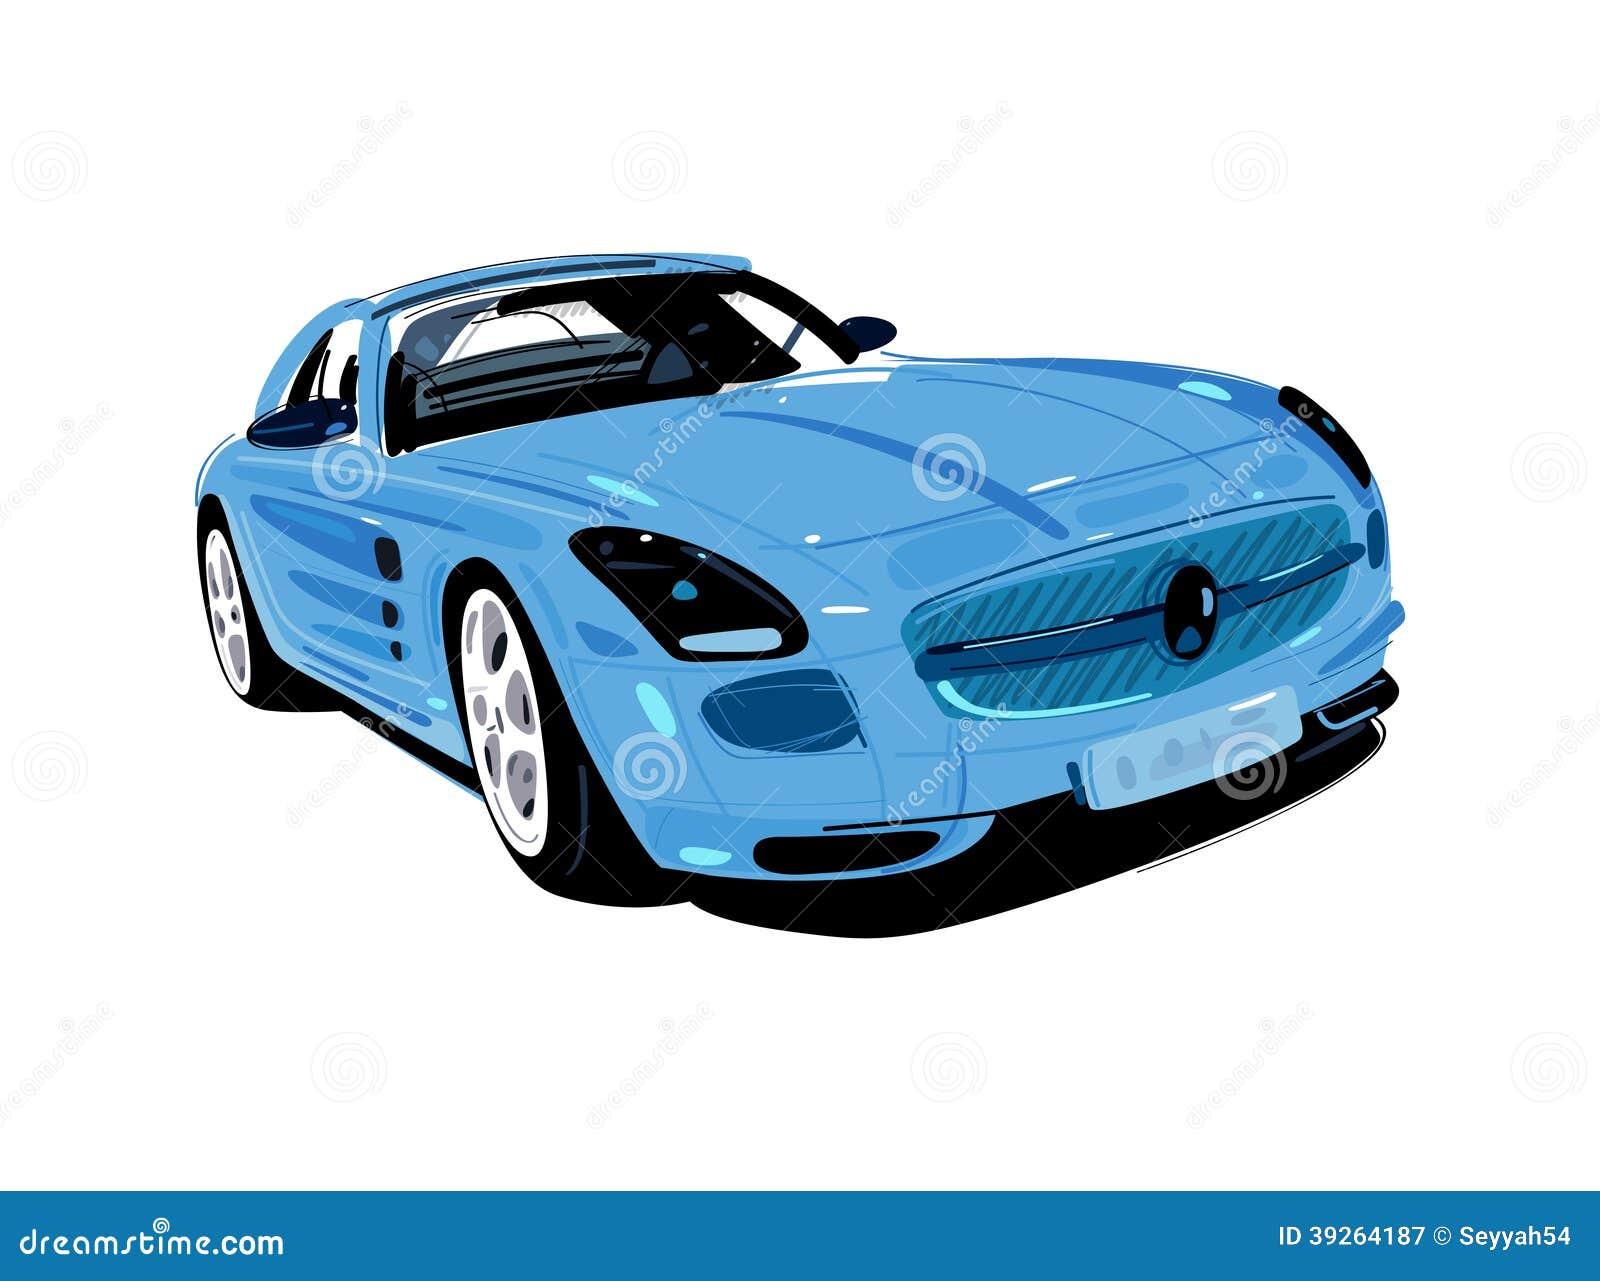 Blue Artistic Auto Stock Illustration Illustration Of Life 39264187